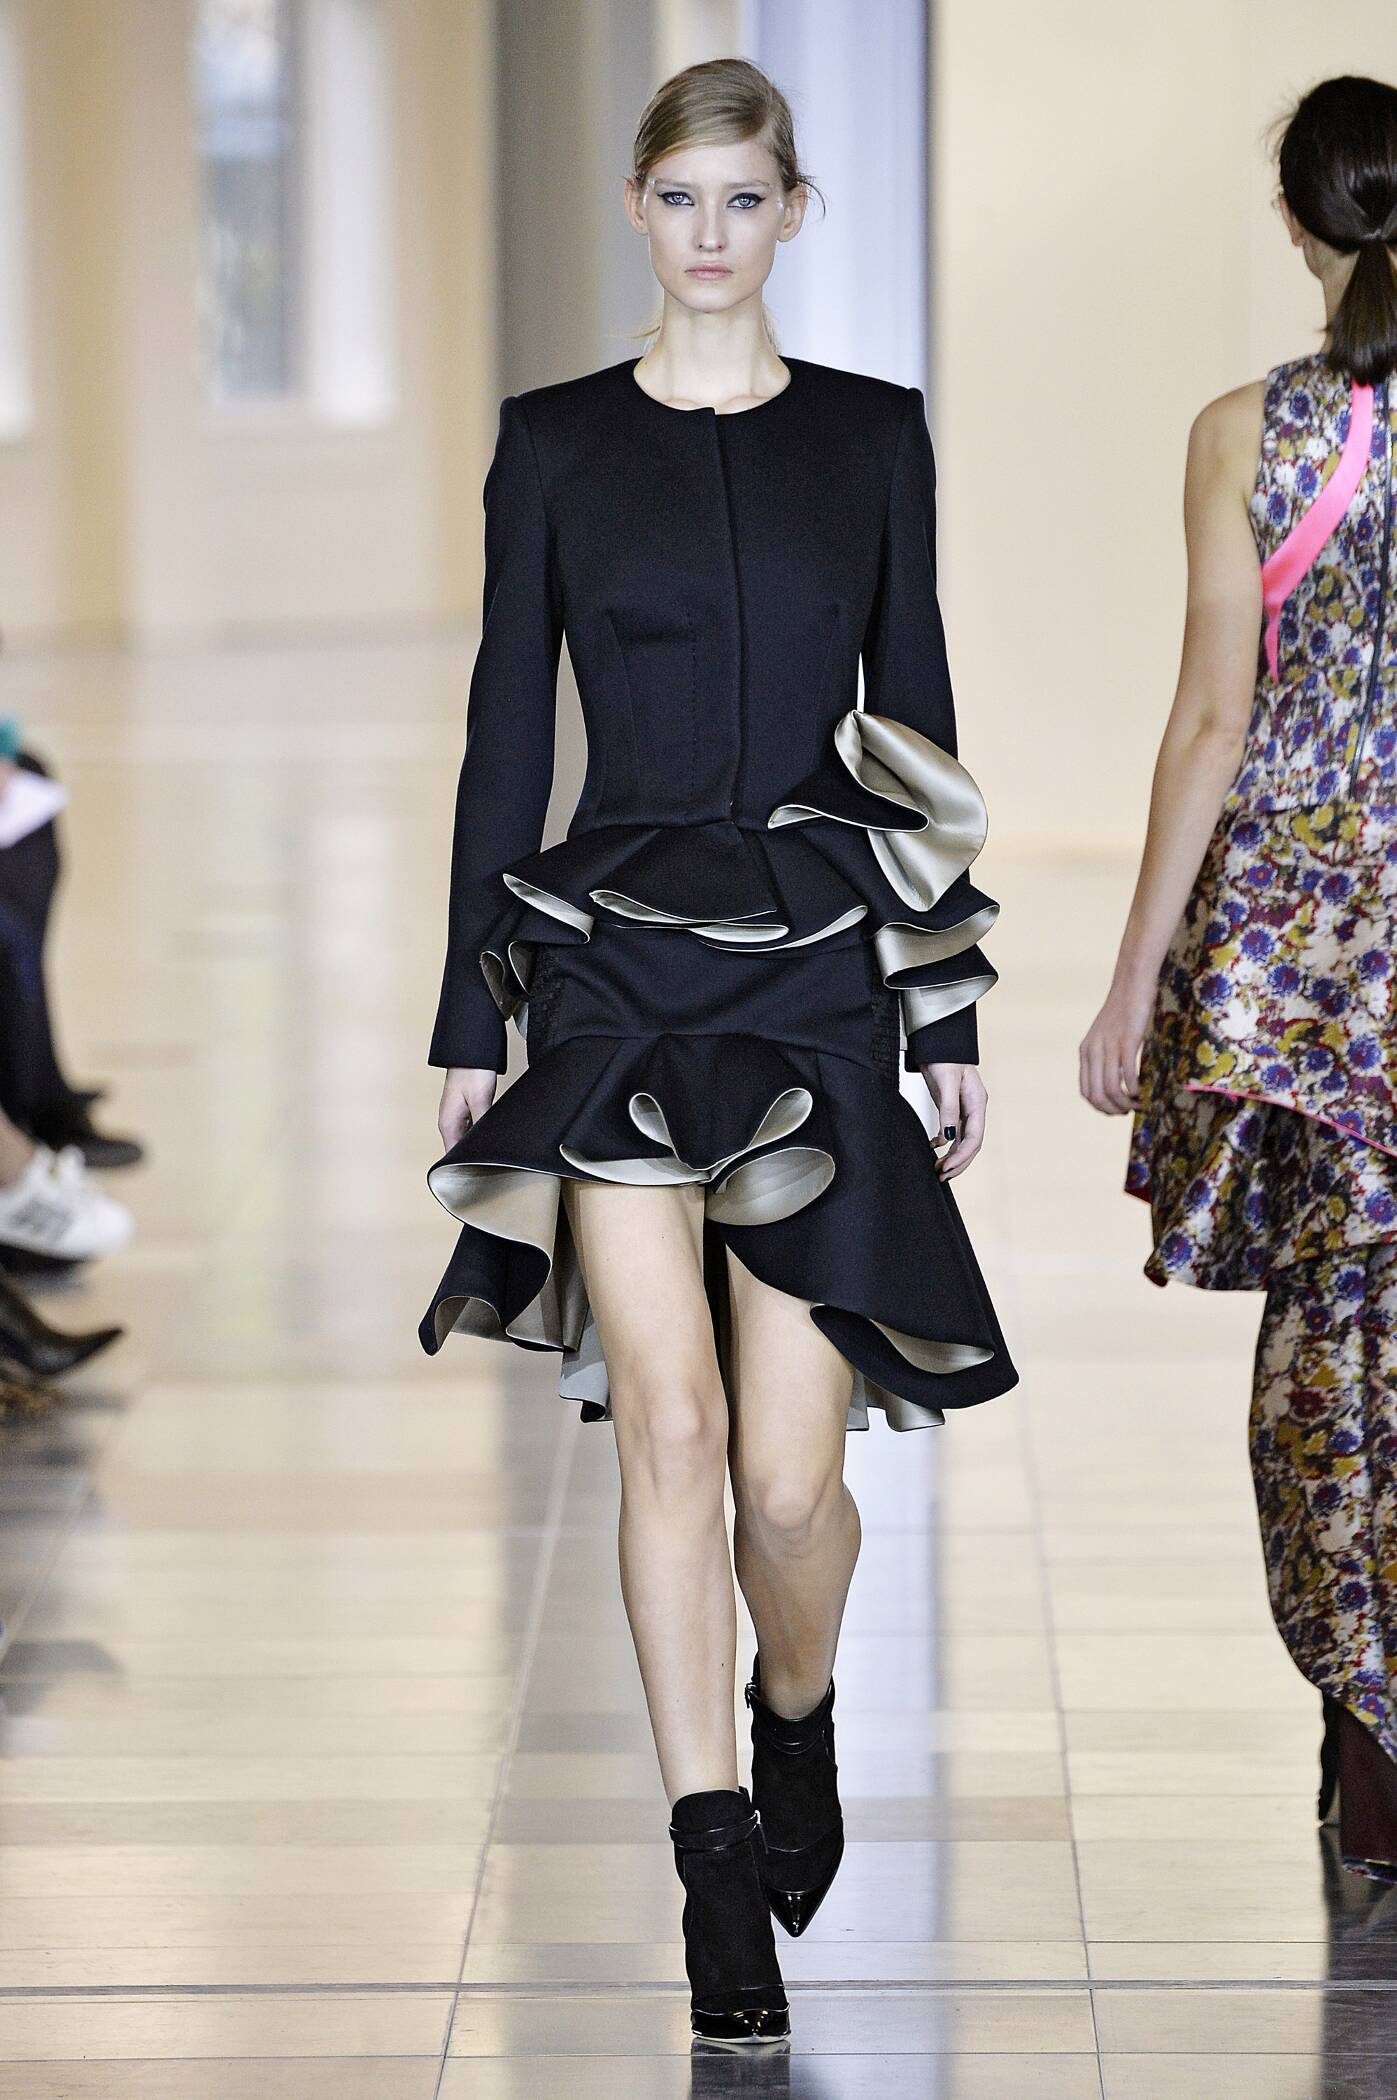 Antonio Berardi Collection Fashion Show FW 2015 2016